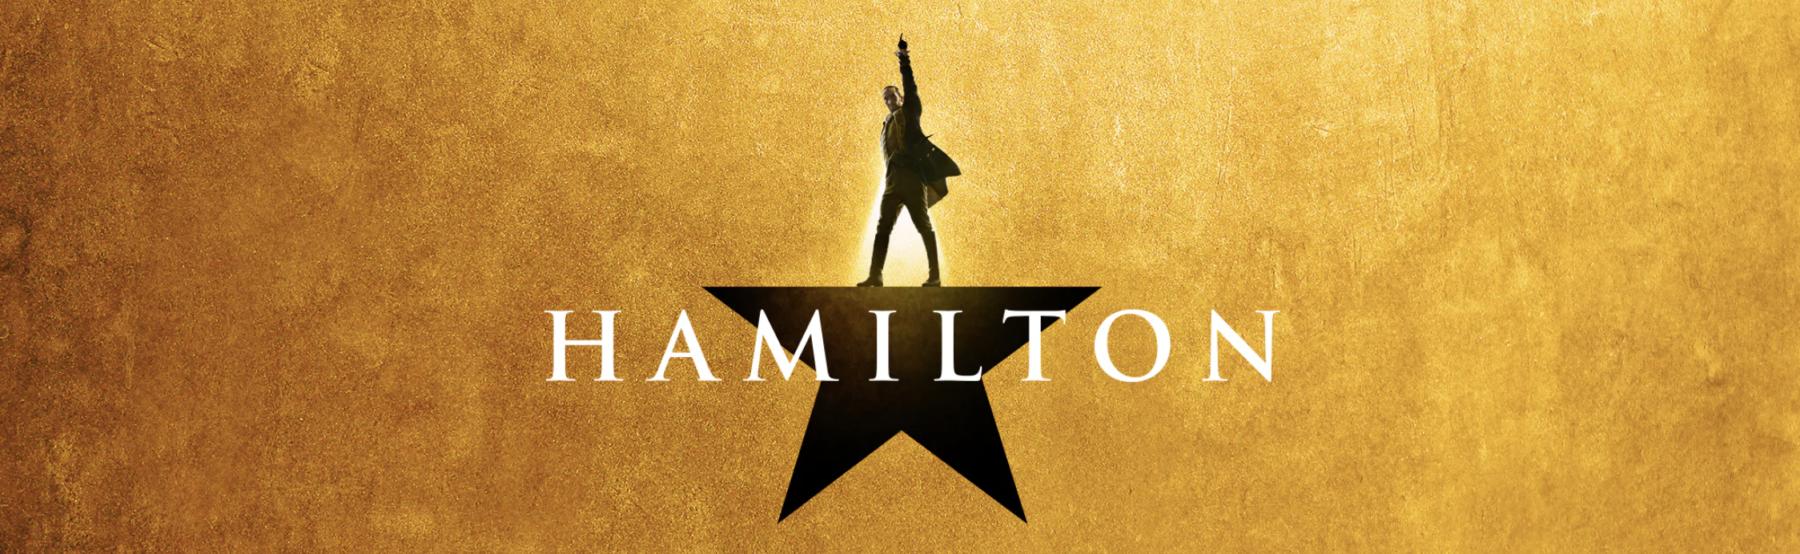 Hamilton Lessons